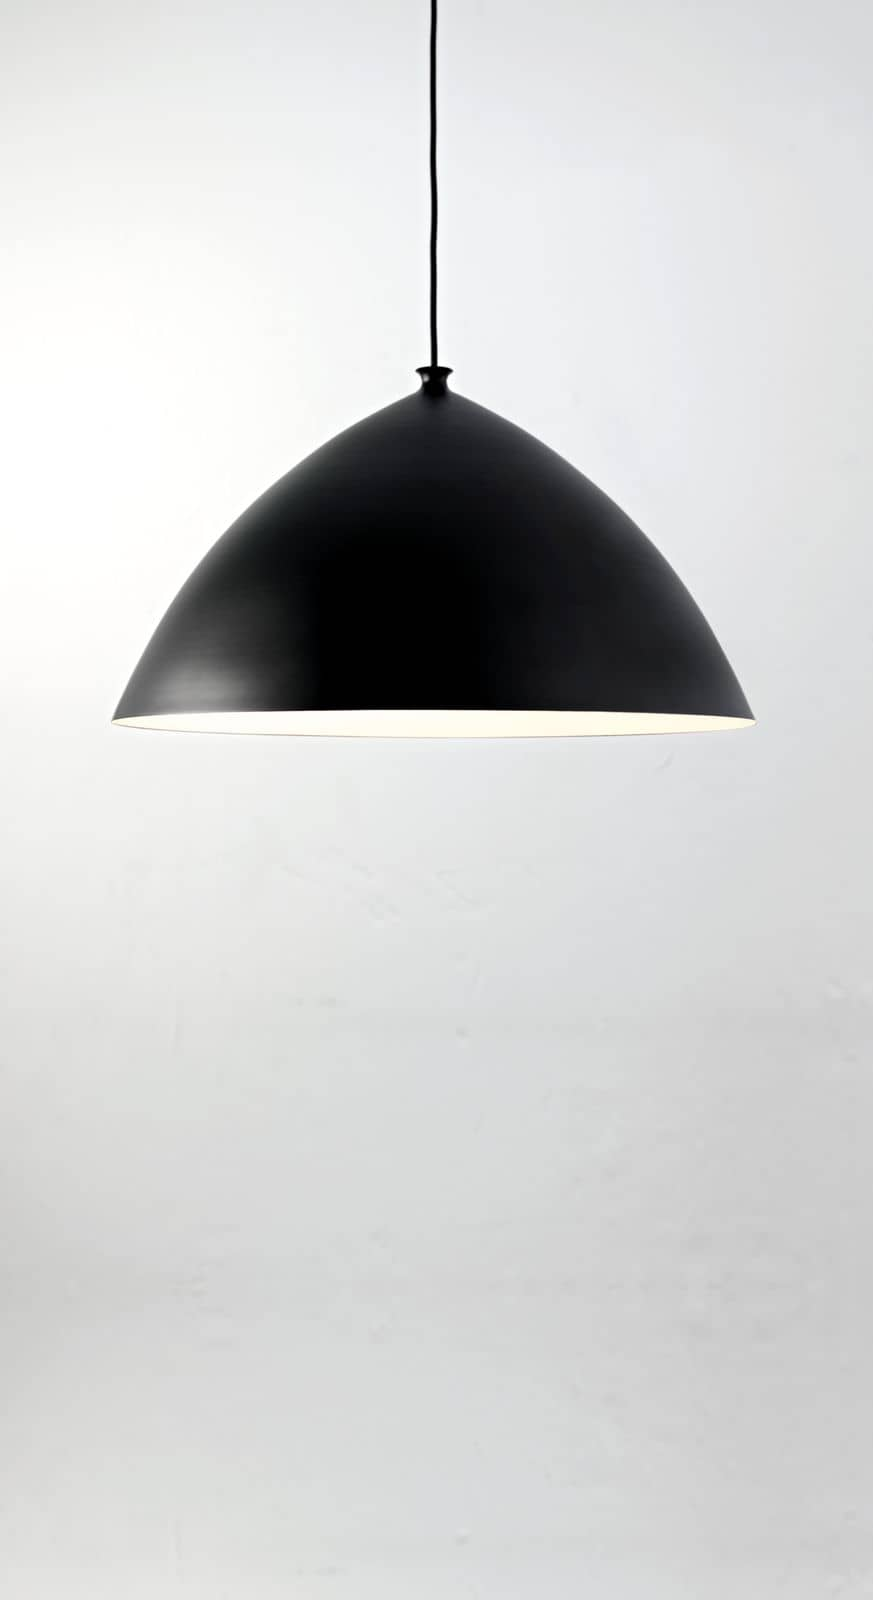 nordlux 71733001 slope 50 pendelleuchte e27 metall stoff schwarz weiss. Black Bedroom Furniture Sets. Home Design Ideas